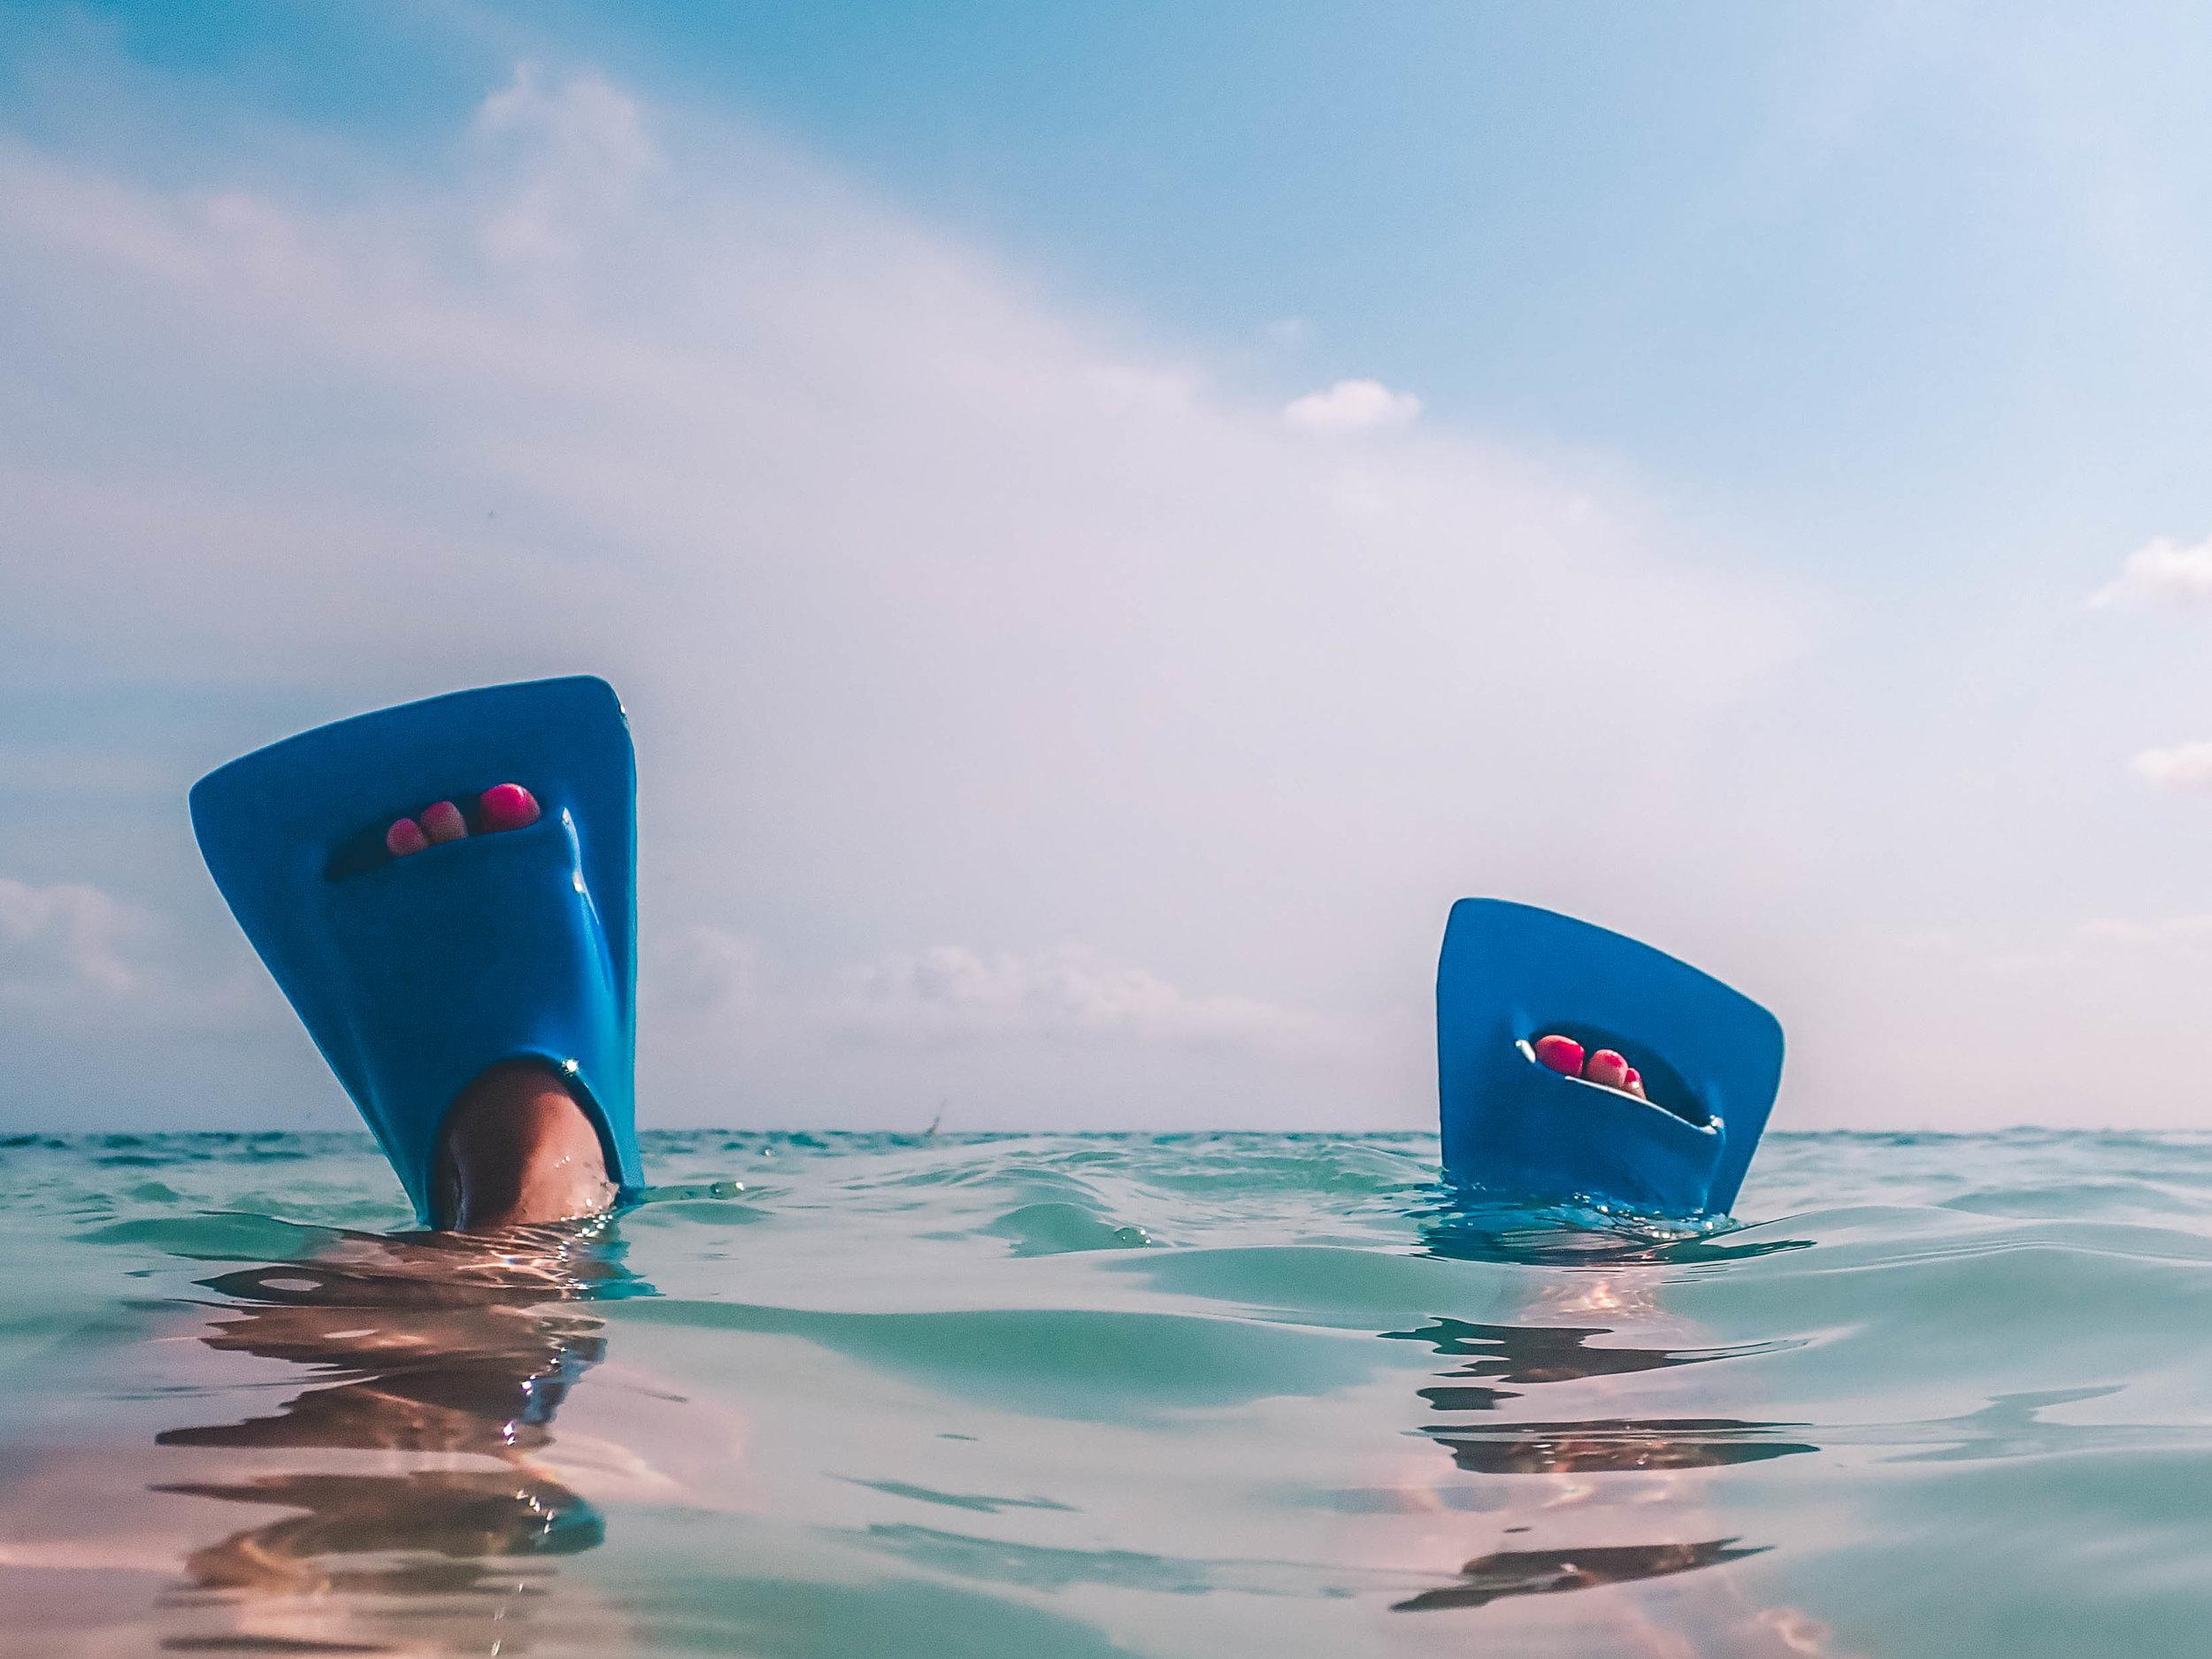 aruba water camera 2019-87.jpg